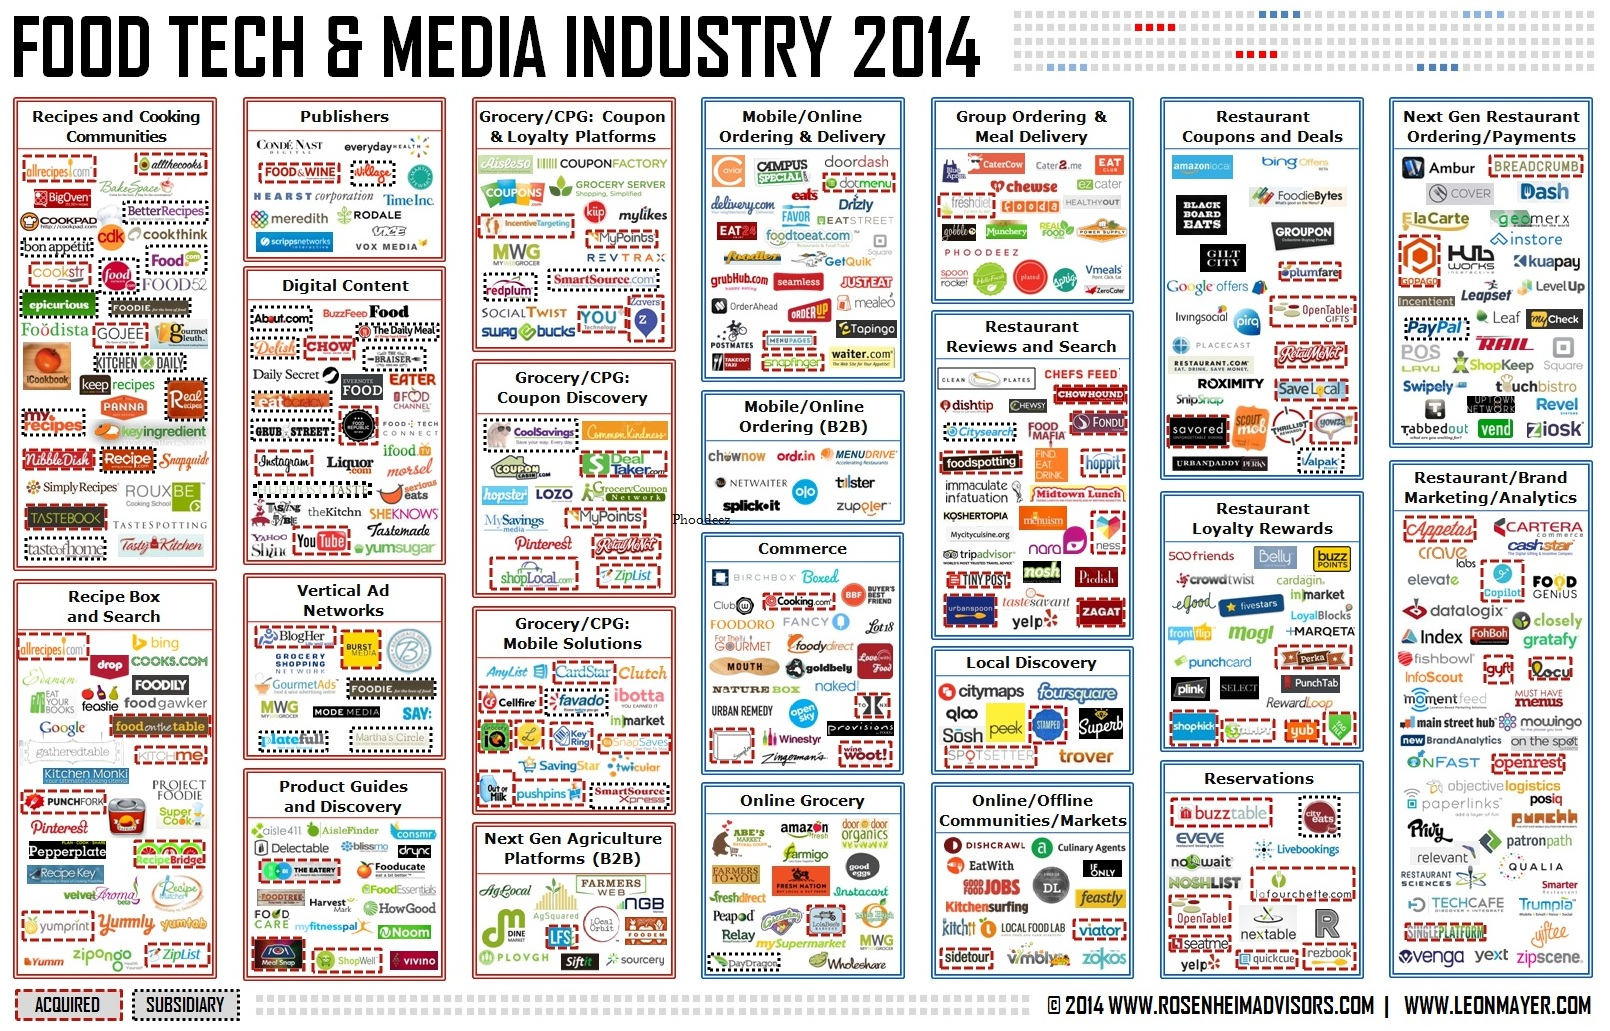 Food Tech and Media Industry 2014 - Rosenheim Advisors and Leon Mayer